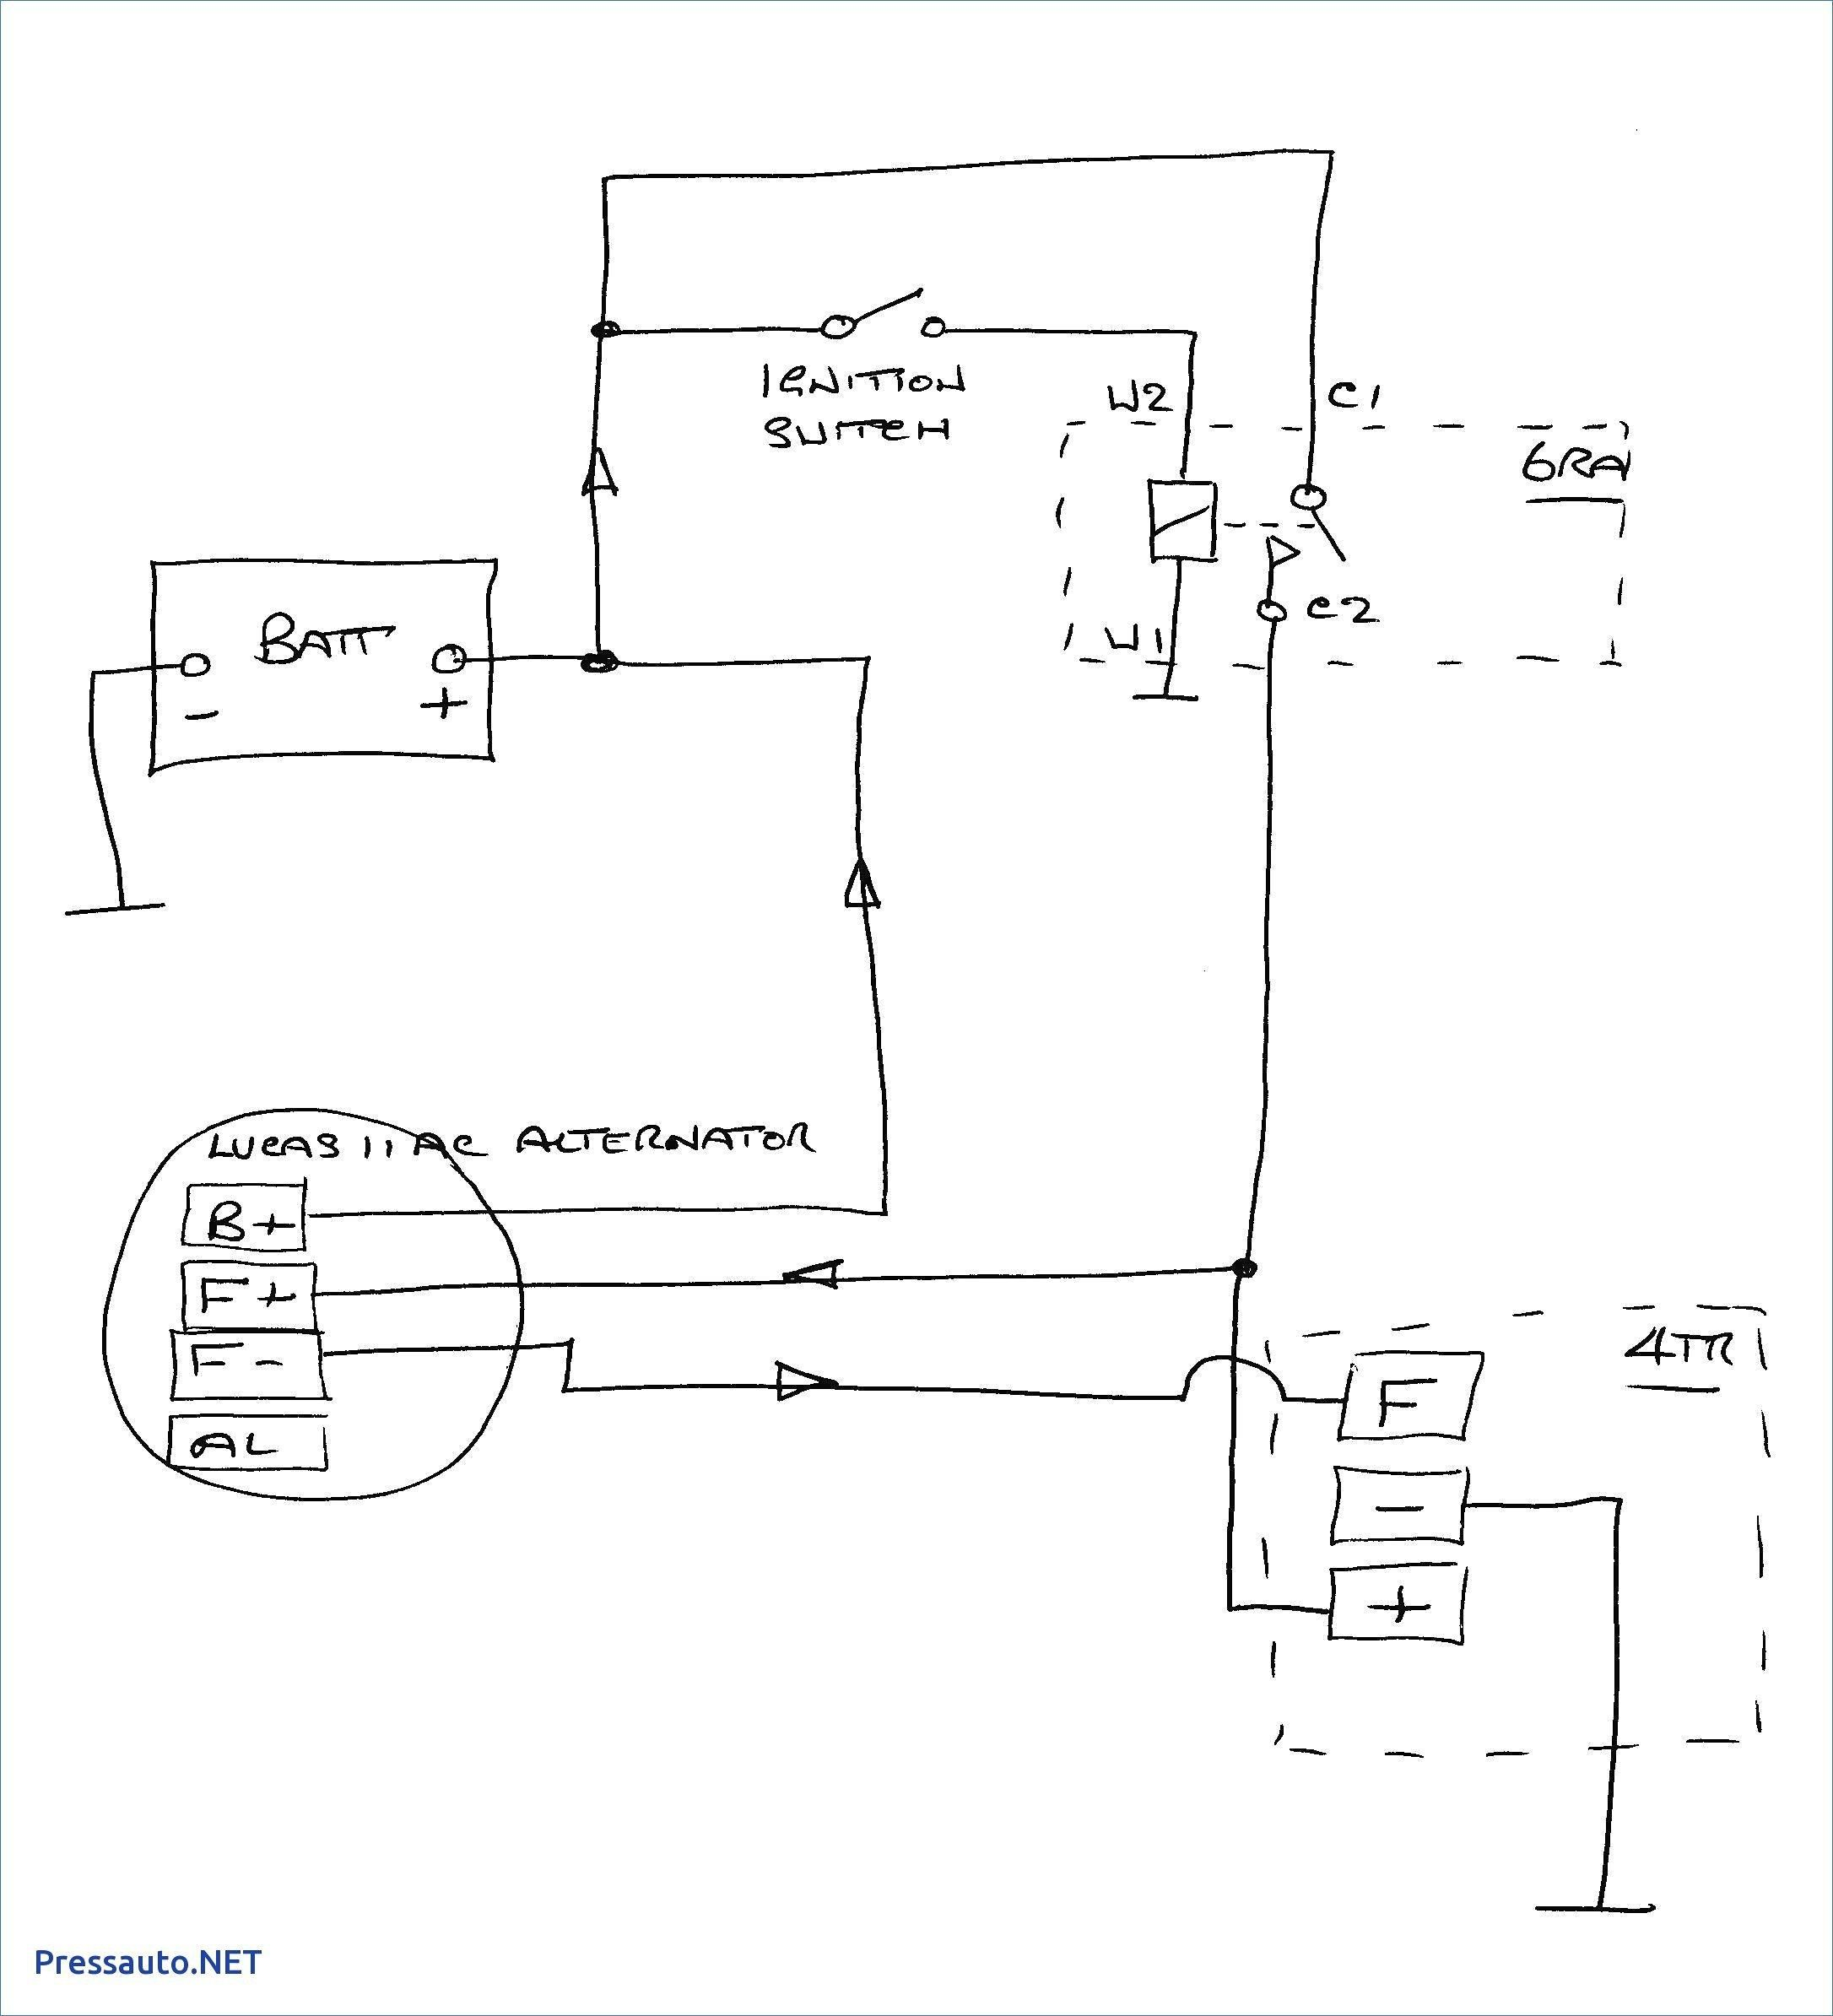 New Mitsubishi Generator Wiring Diagram  Diagram  Diagramsample  Diagramtemplate  Wiringdiagram